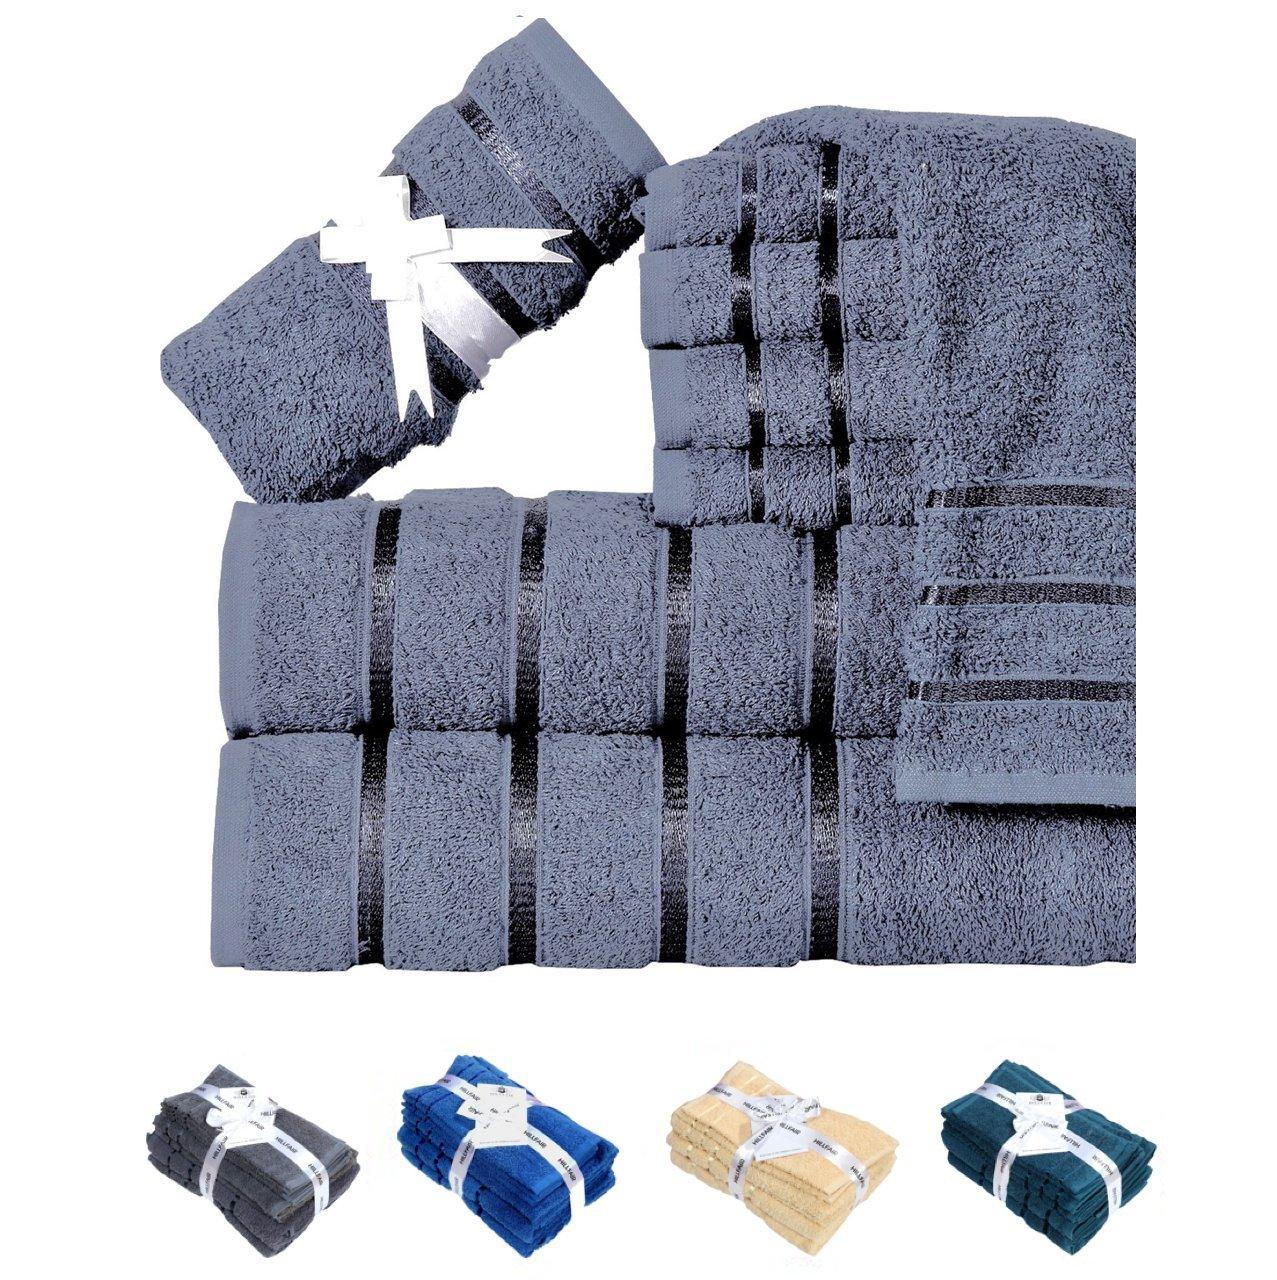 HILLFAIR 600 GSM Luxury 8-Piece 100% Long-Staple Combed Cotton Bath Towel Set (GREY); 2 Bath Towels,2 Hand Towels,4 Washcloths, Hotel & Spa Towels, Turkish Cotton Quality, Super Soft & Absorbent